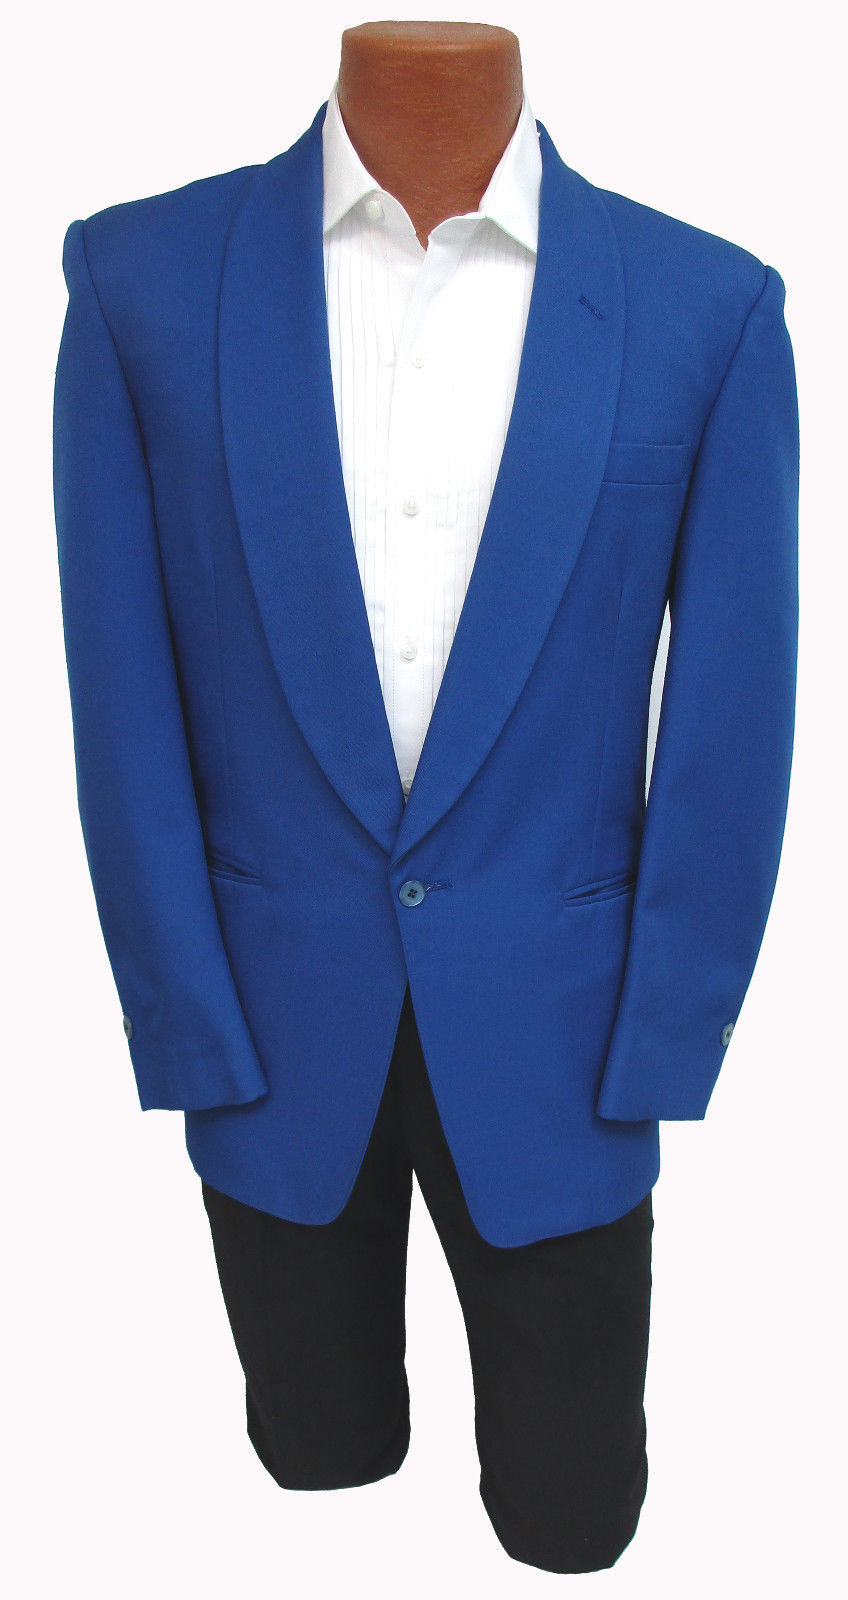 Miami Vice dinner jacket.jpg